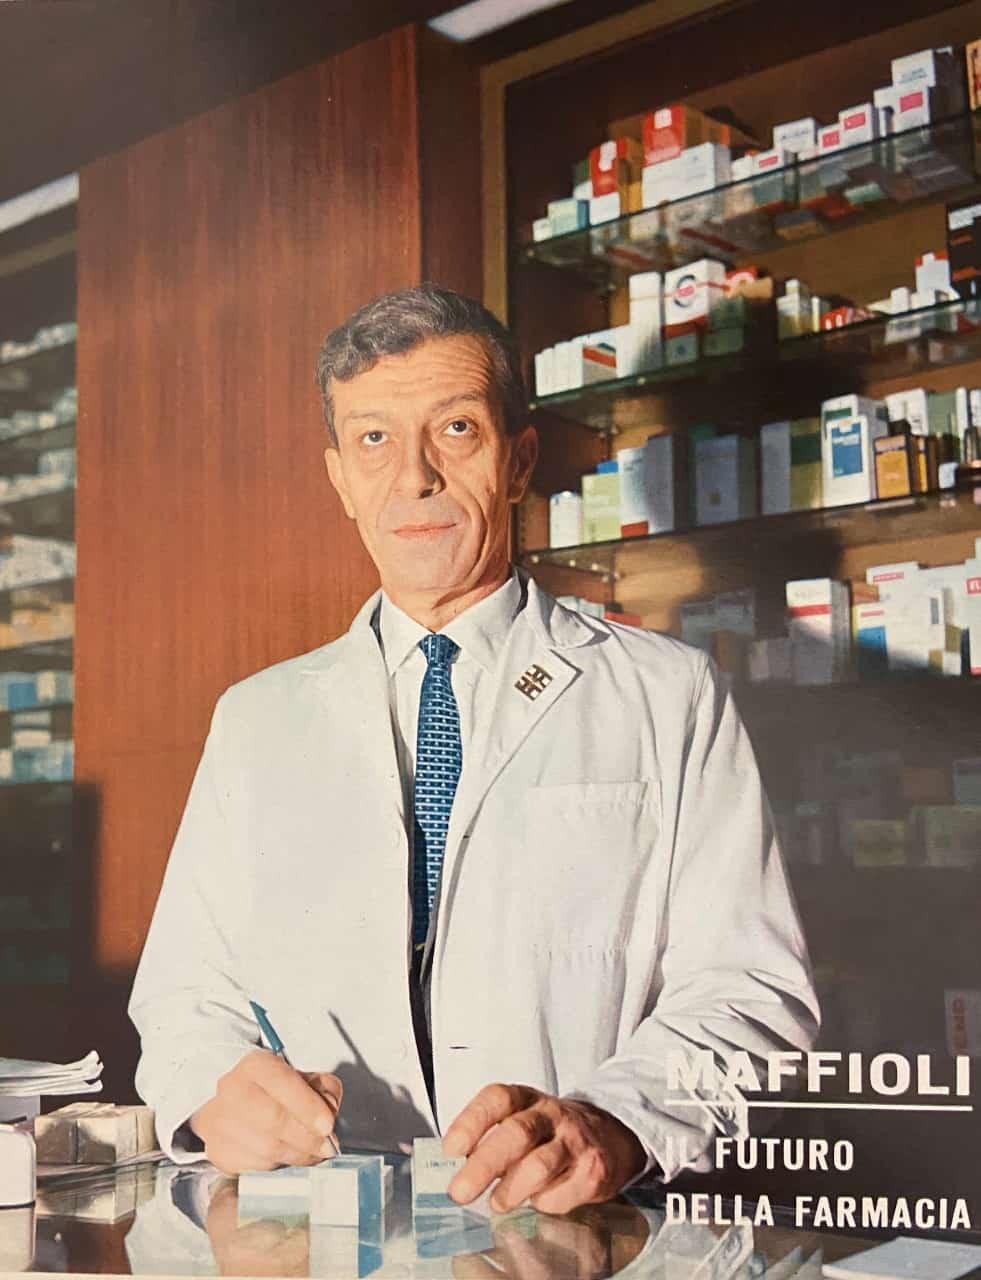 Dottor Maffioli